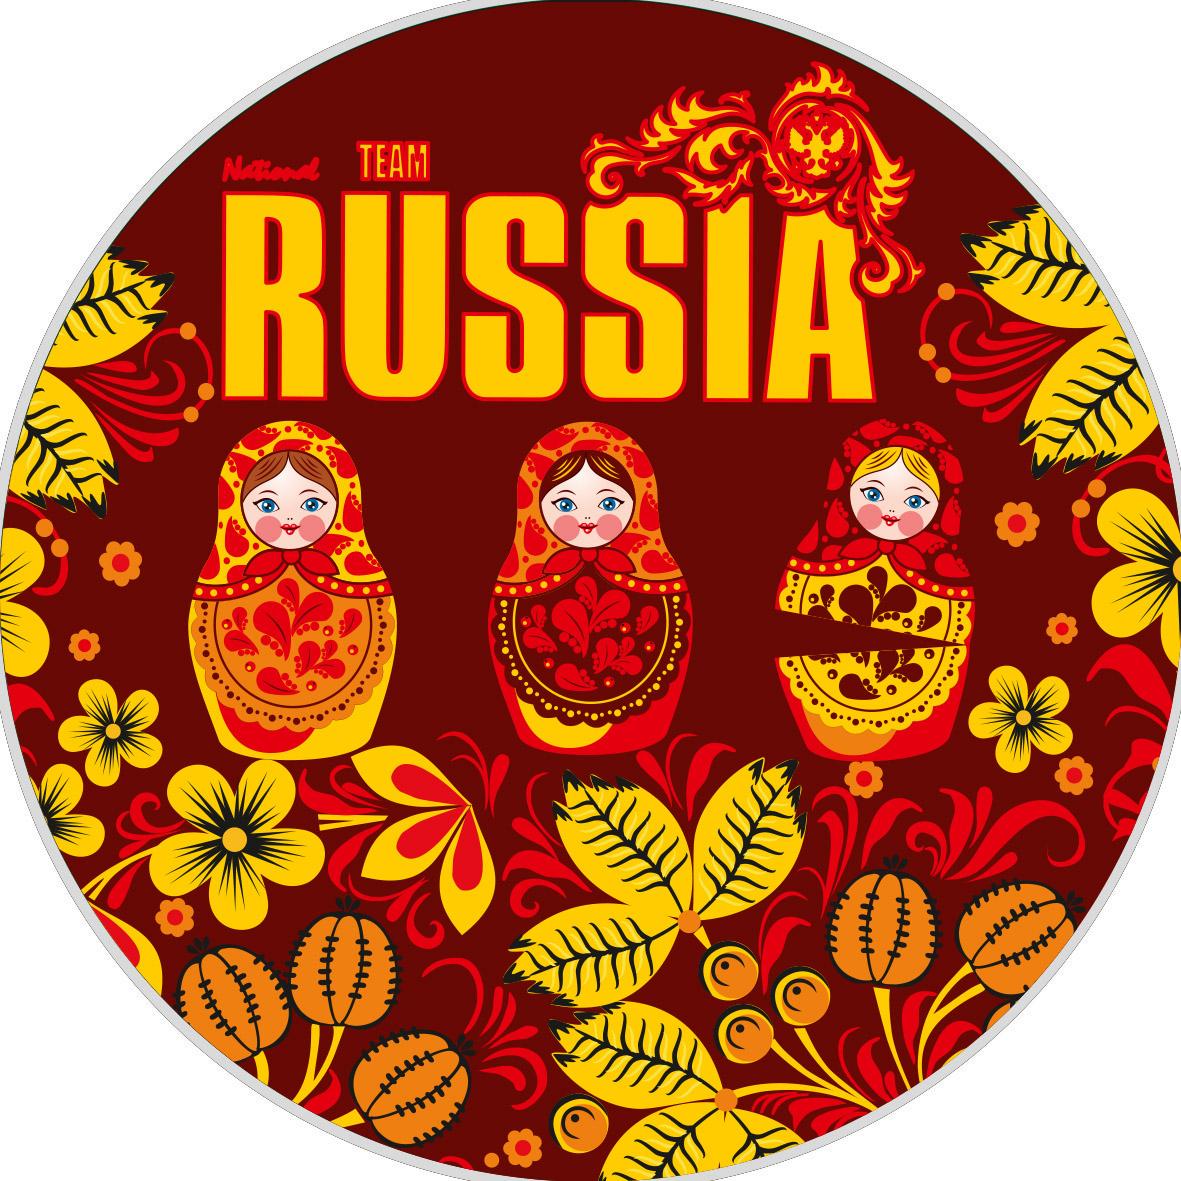 Наклейка RUSSIA «Матрёшки»